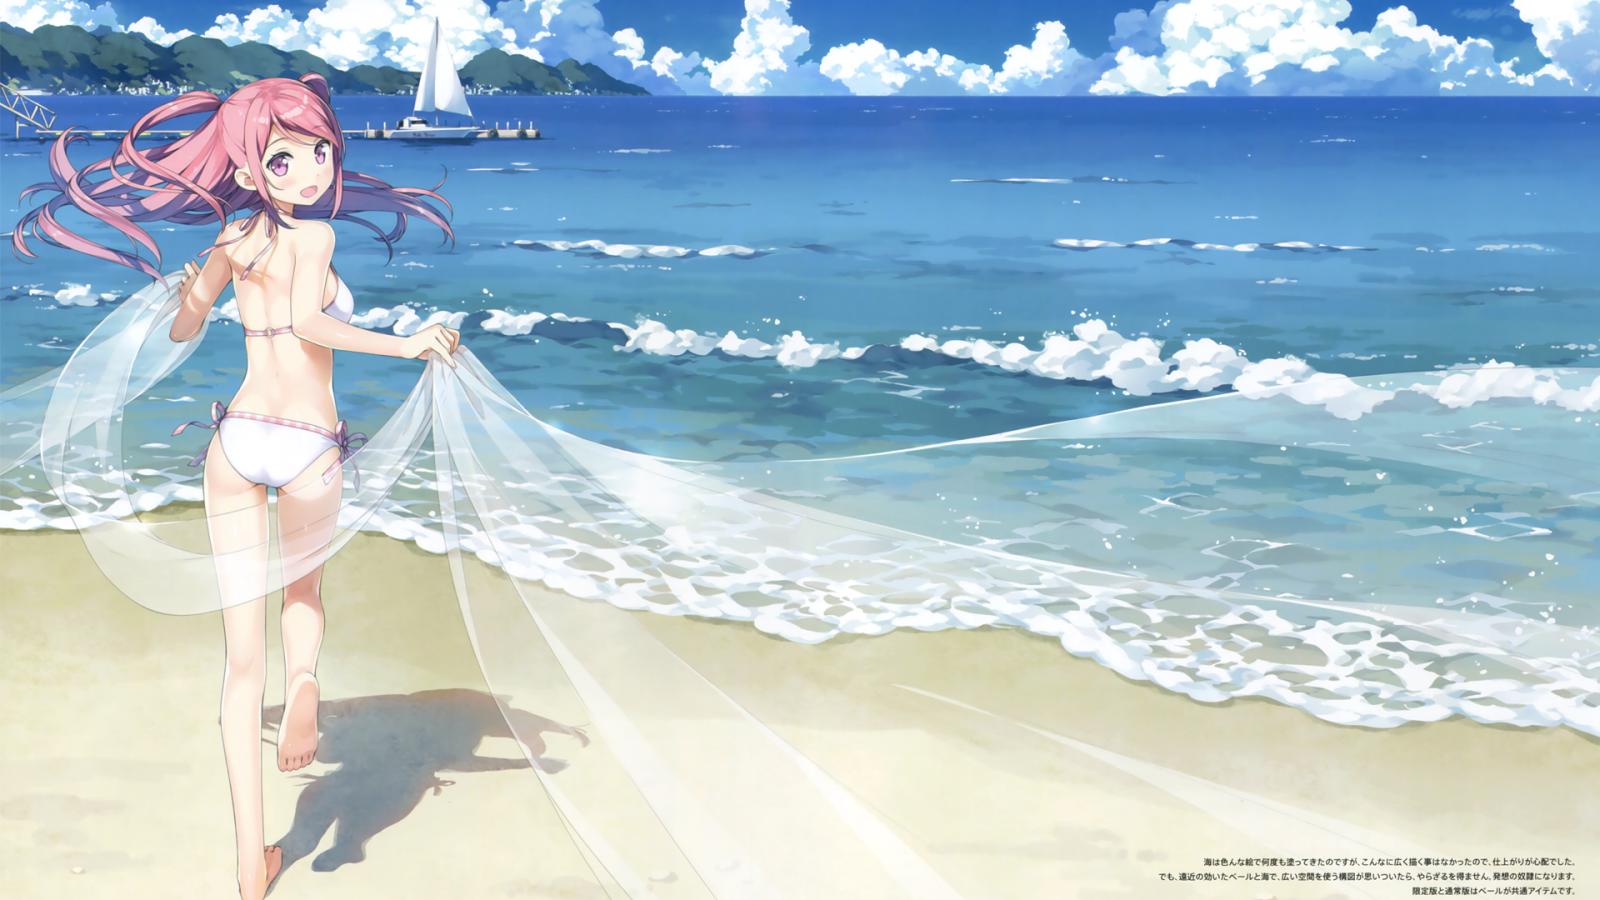 Wallpaper kurumi kantoku anime girls bikini beach - Beach anime girl ...